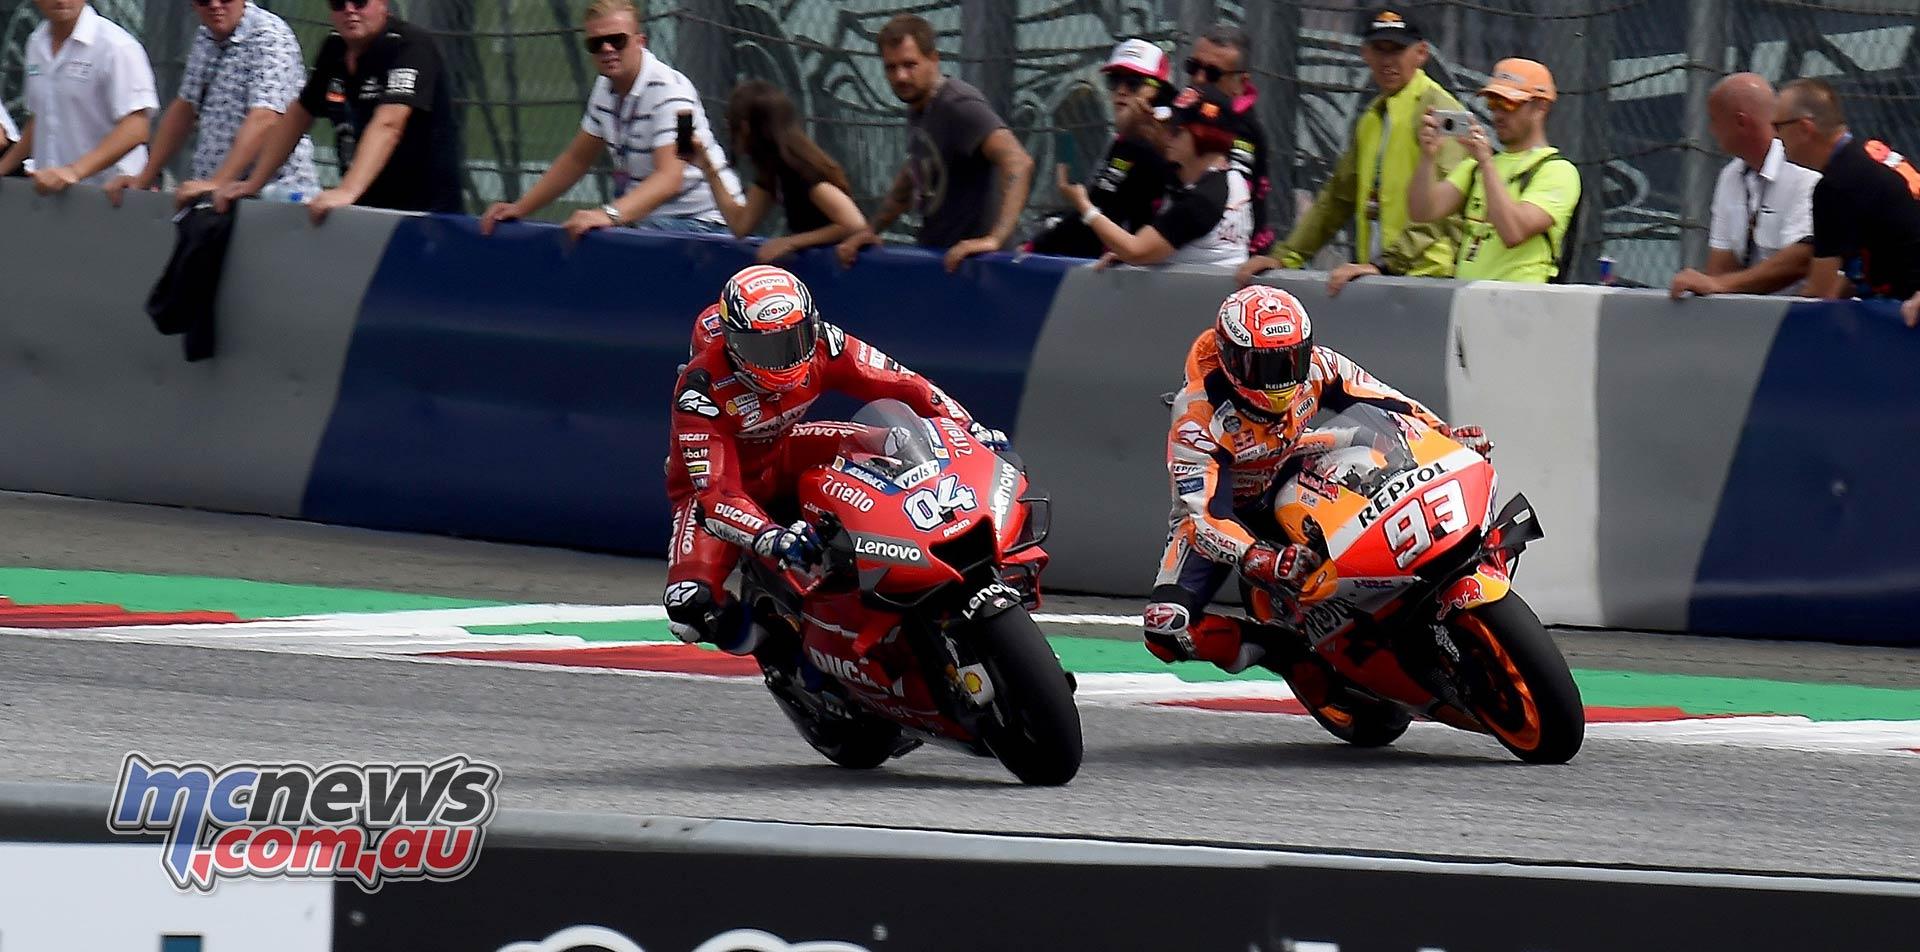 MotoGP Rnd RedBullRing Race Dovizioso Marquez